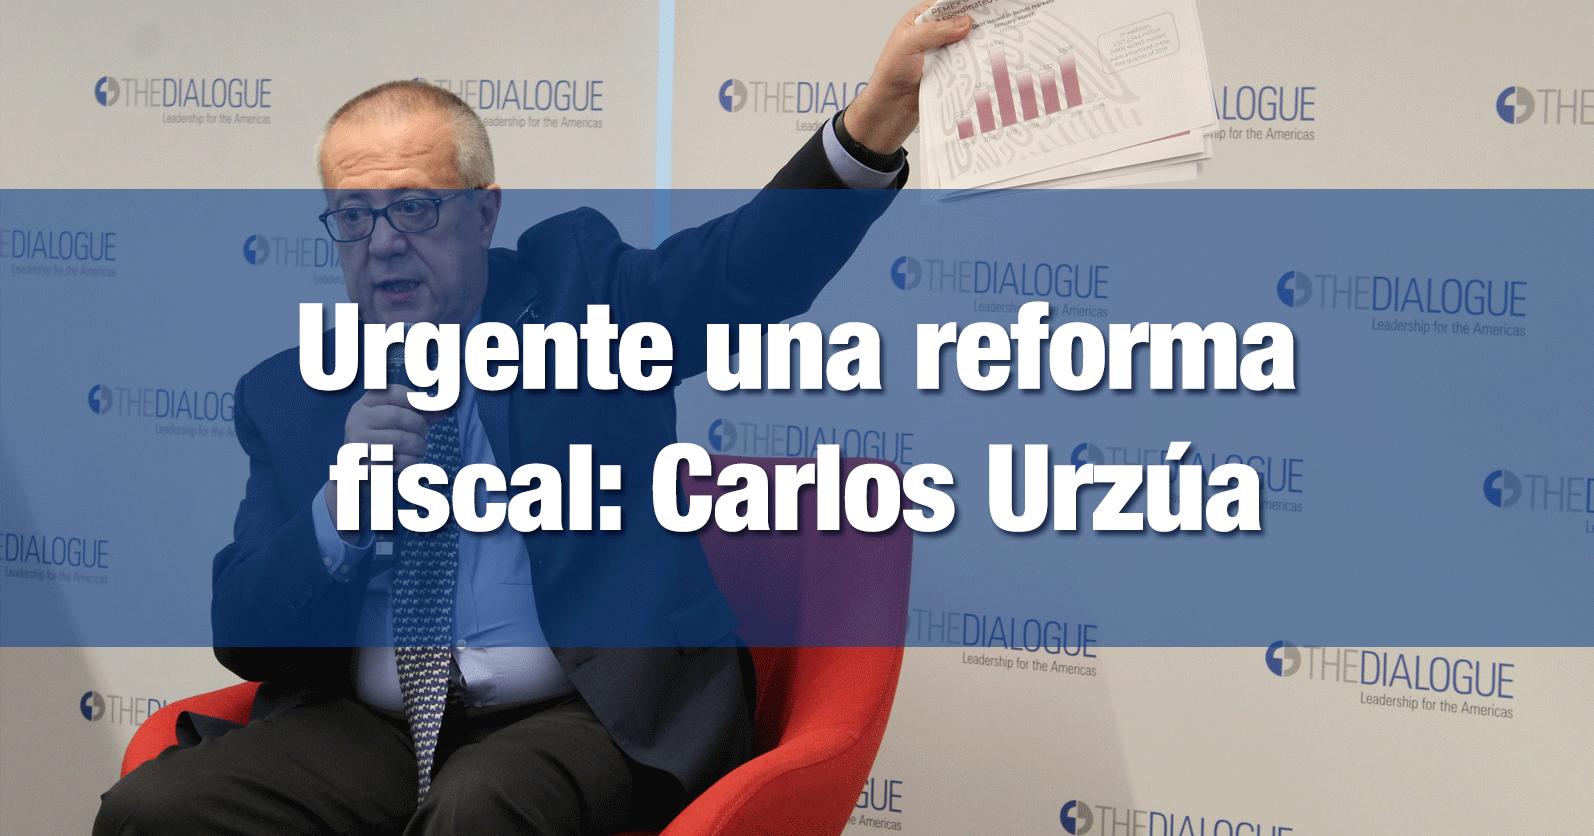 Urgente una reforma fiscal: Carlos Urzúa